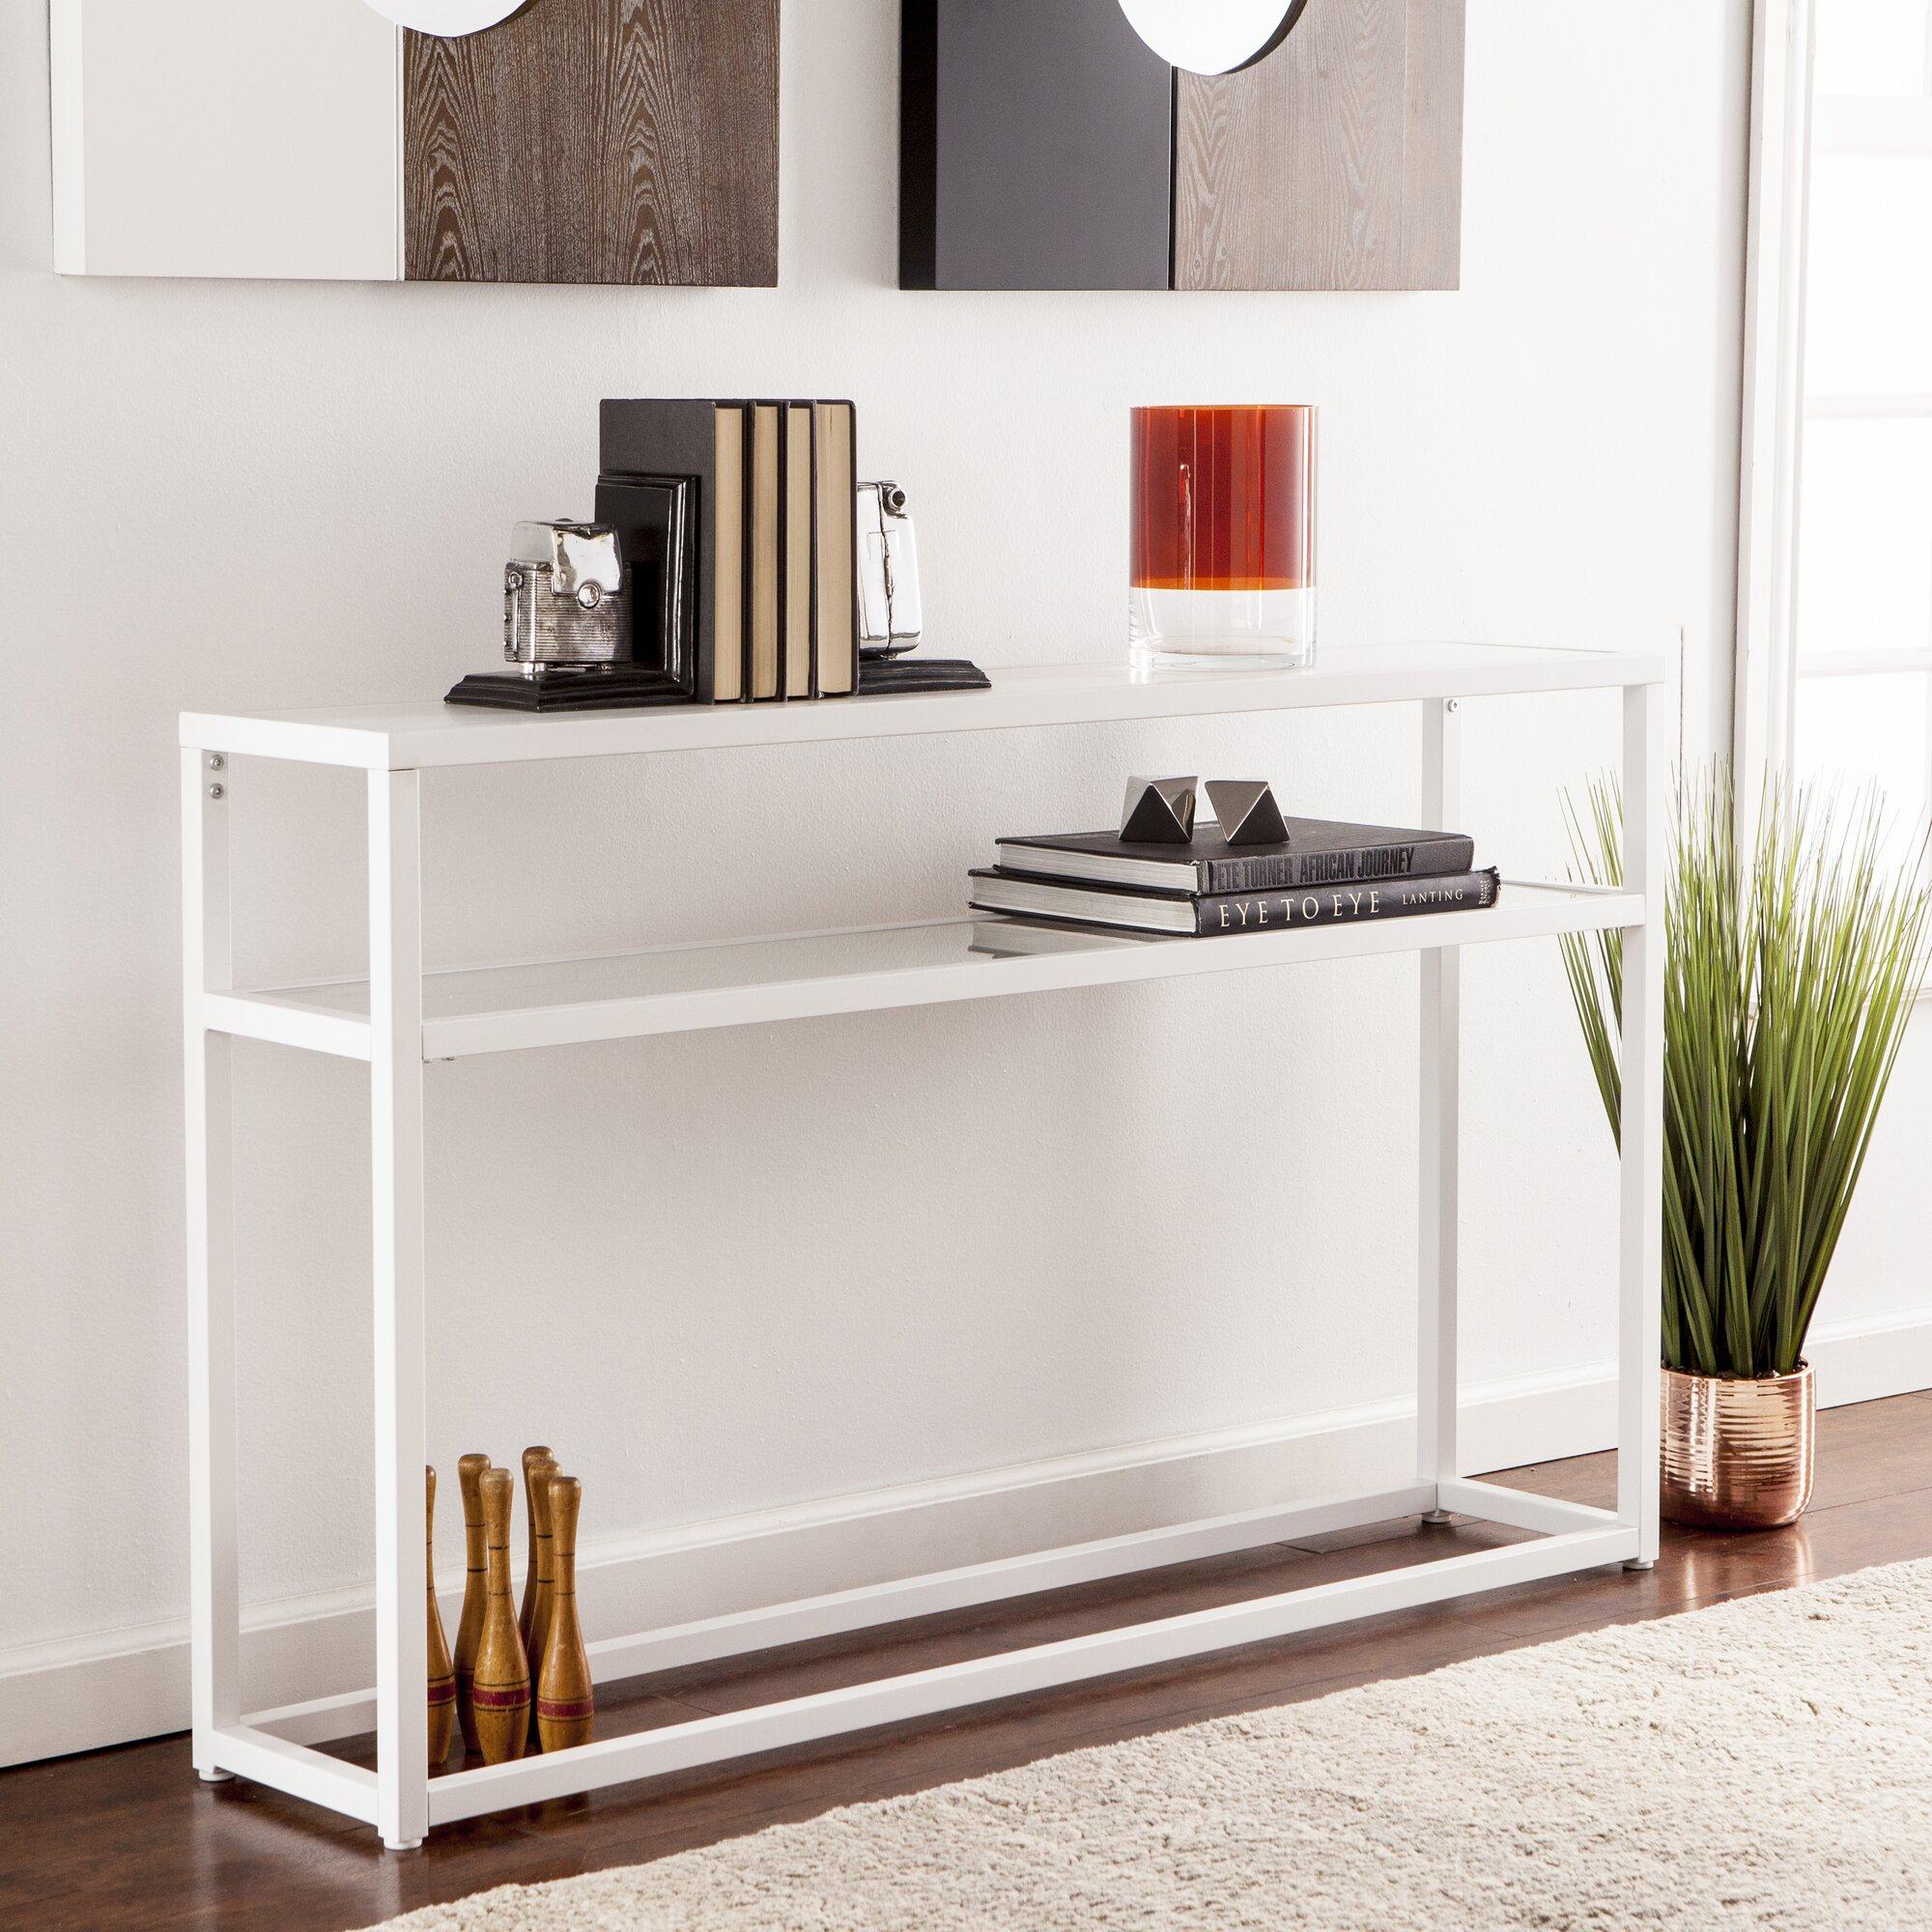 holly martin baldrick narrow console table reviews. Black Bedroom Furniture Sets. Home Design Ideas